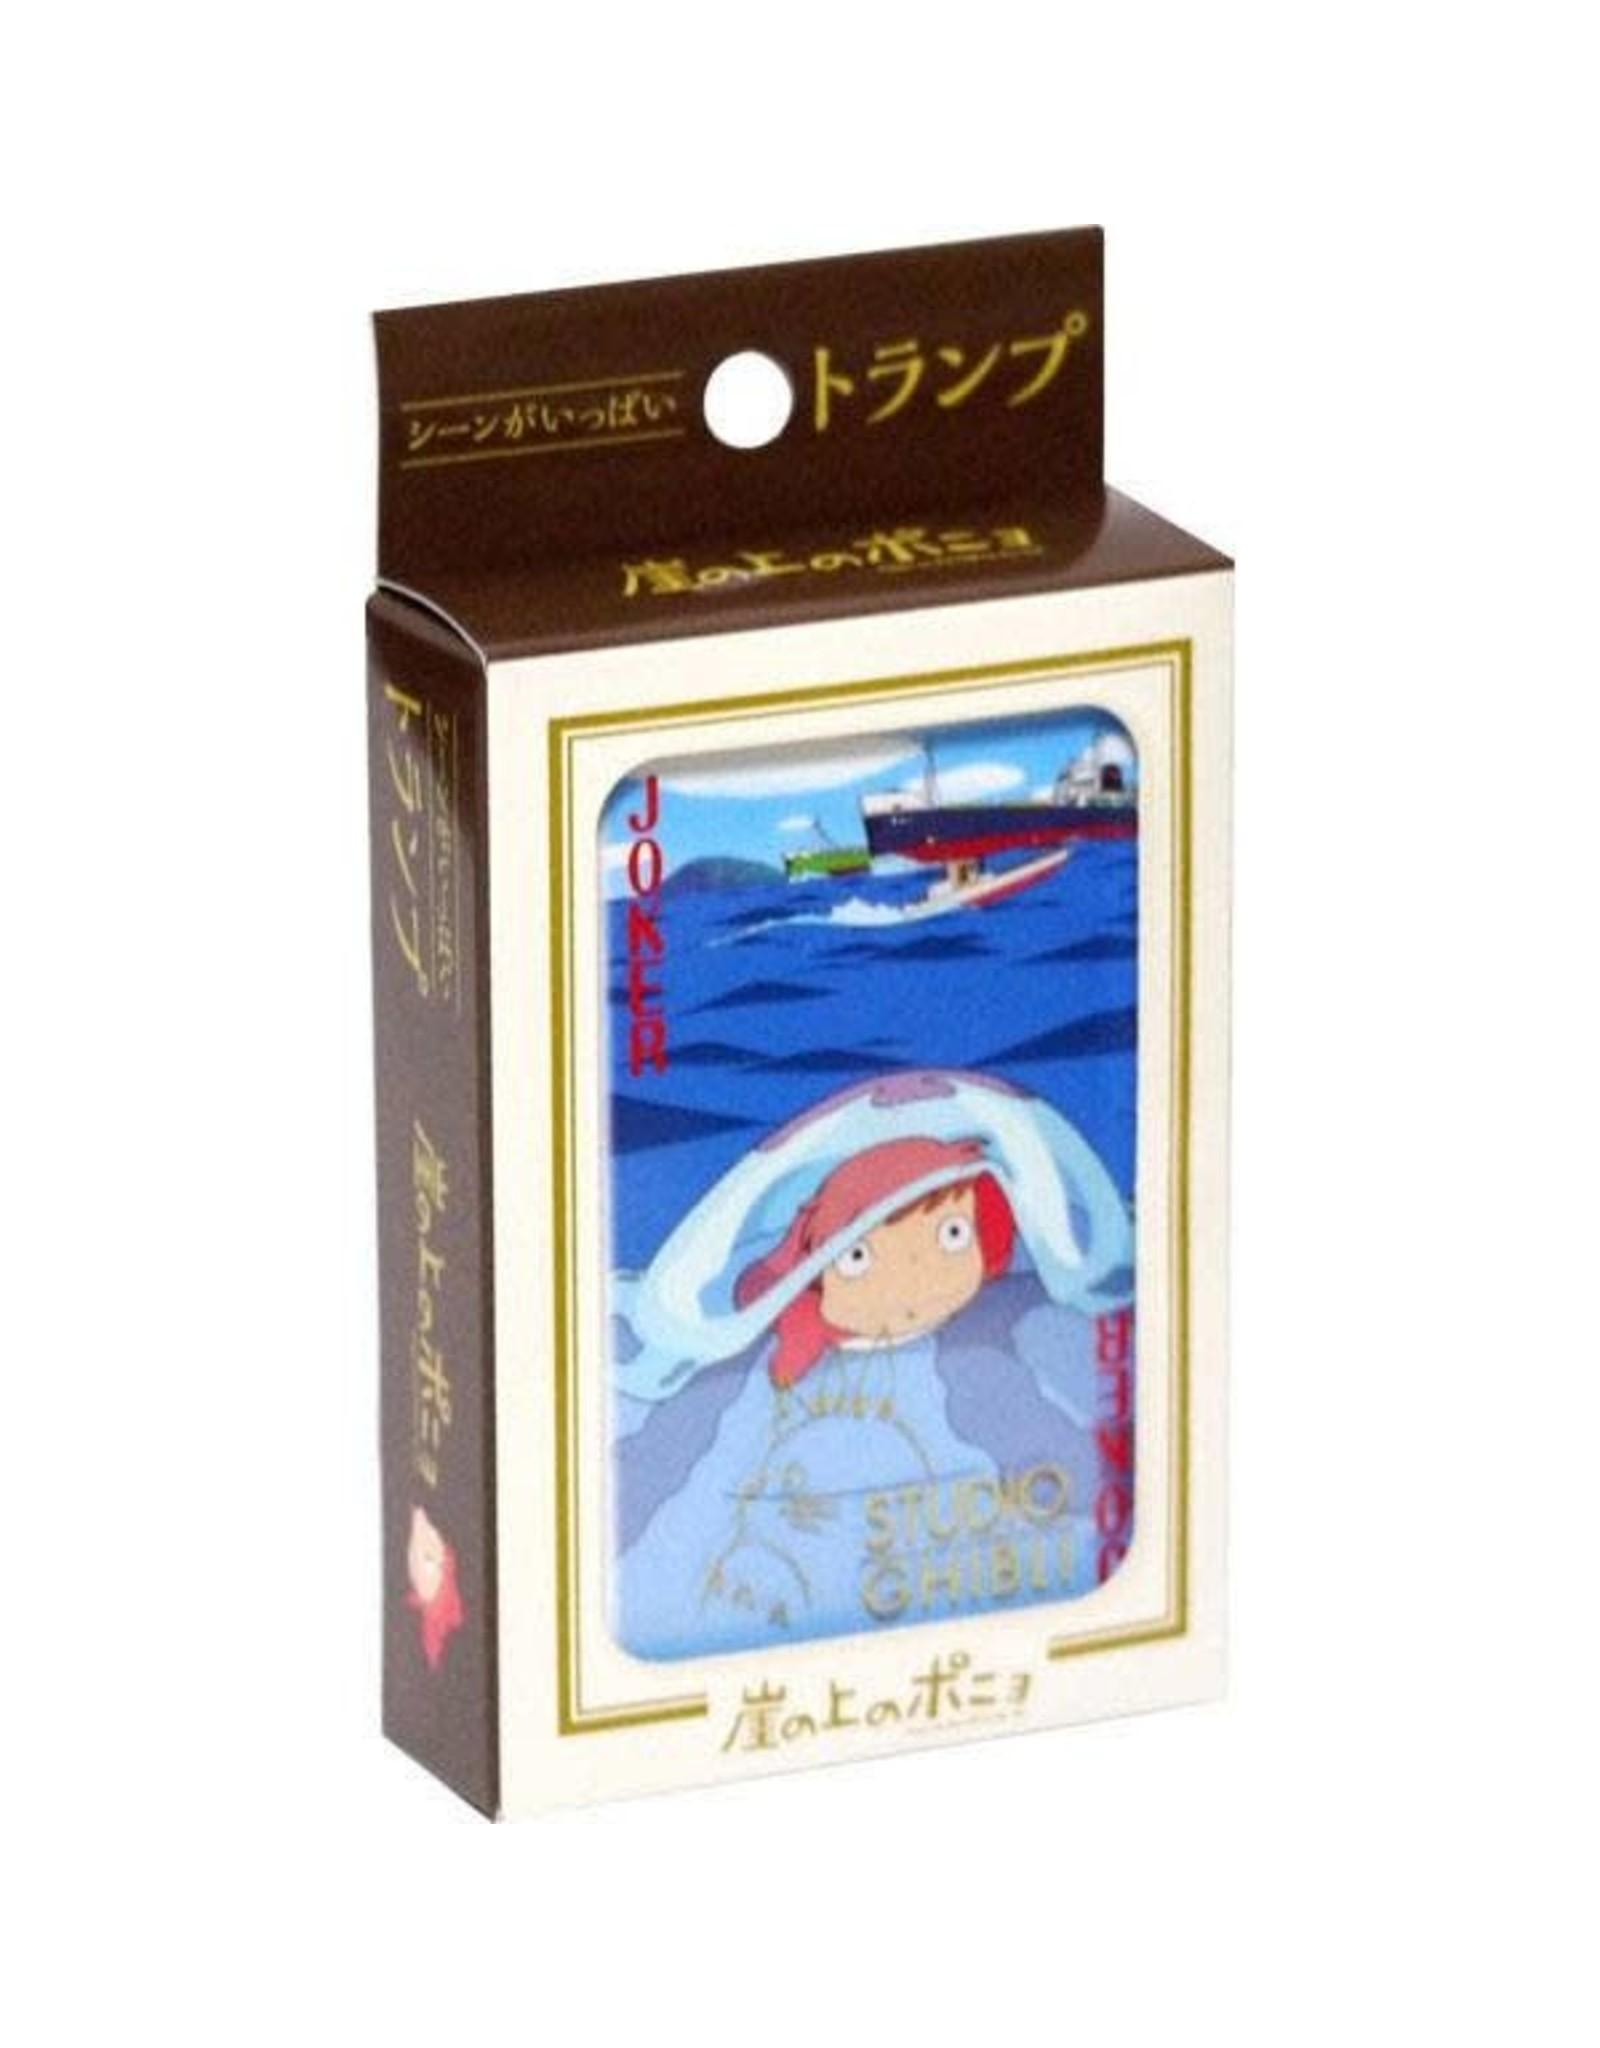 Ponyo - Studio Ghibli Playing Cards (Japanese import)